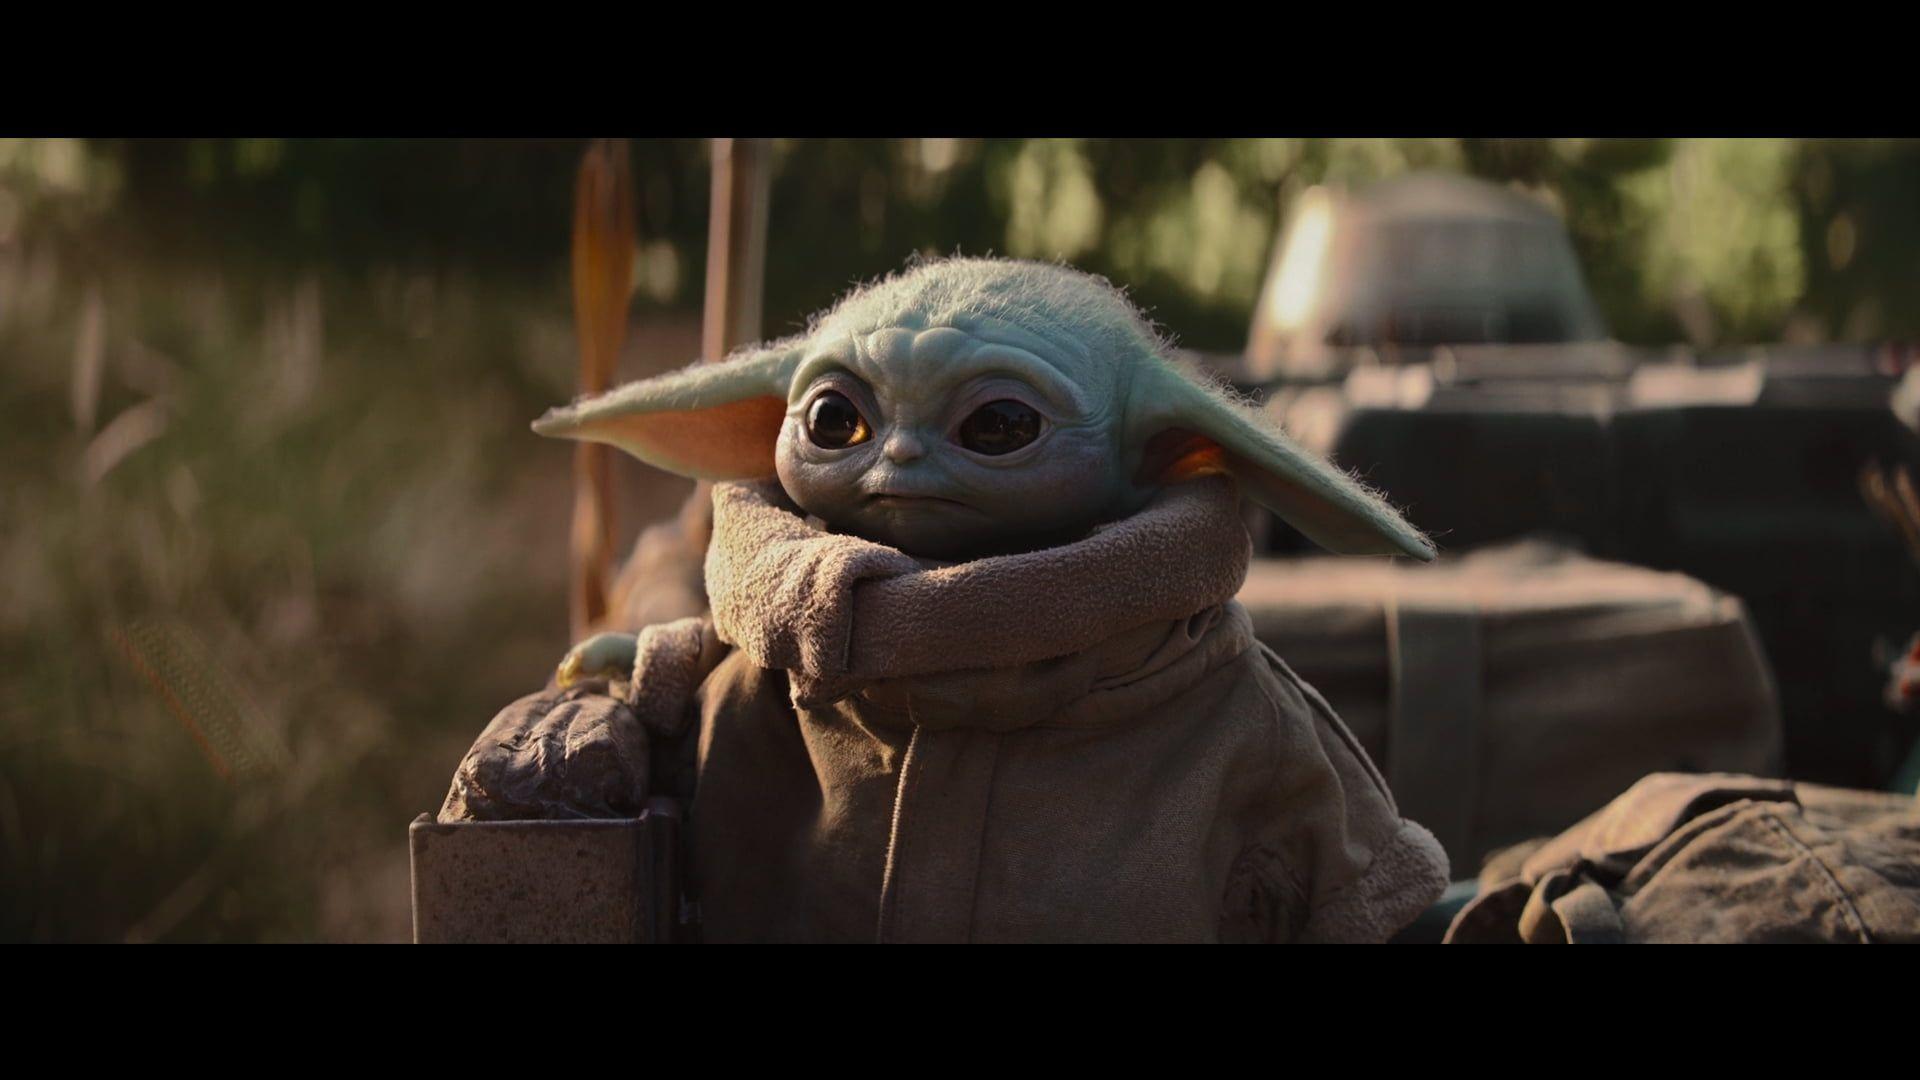 The Mandalorian Star Wars Yoda Baby Yoda Tv Series Movie Scenes Space Science Fiction 1080p Wa Yoda Wallpaper Star Wars Characters Yoda Star Wars Wallpaper